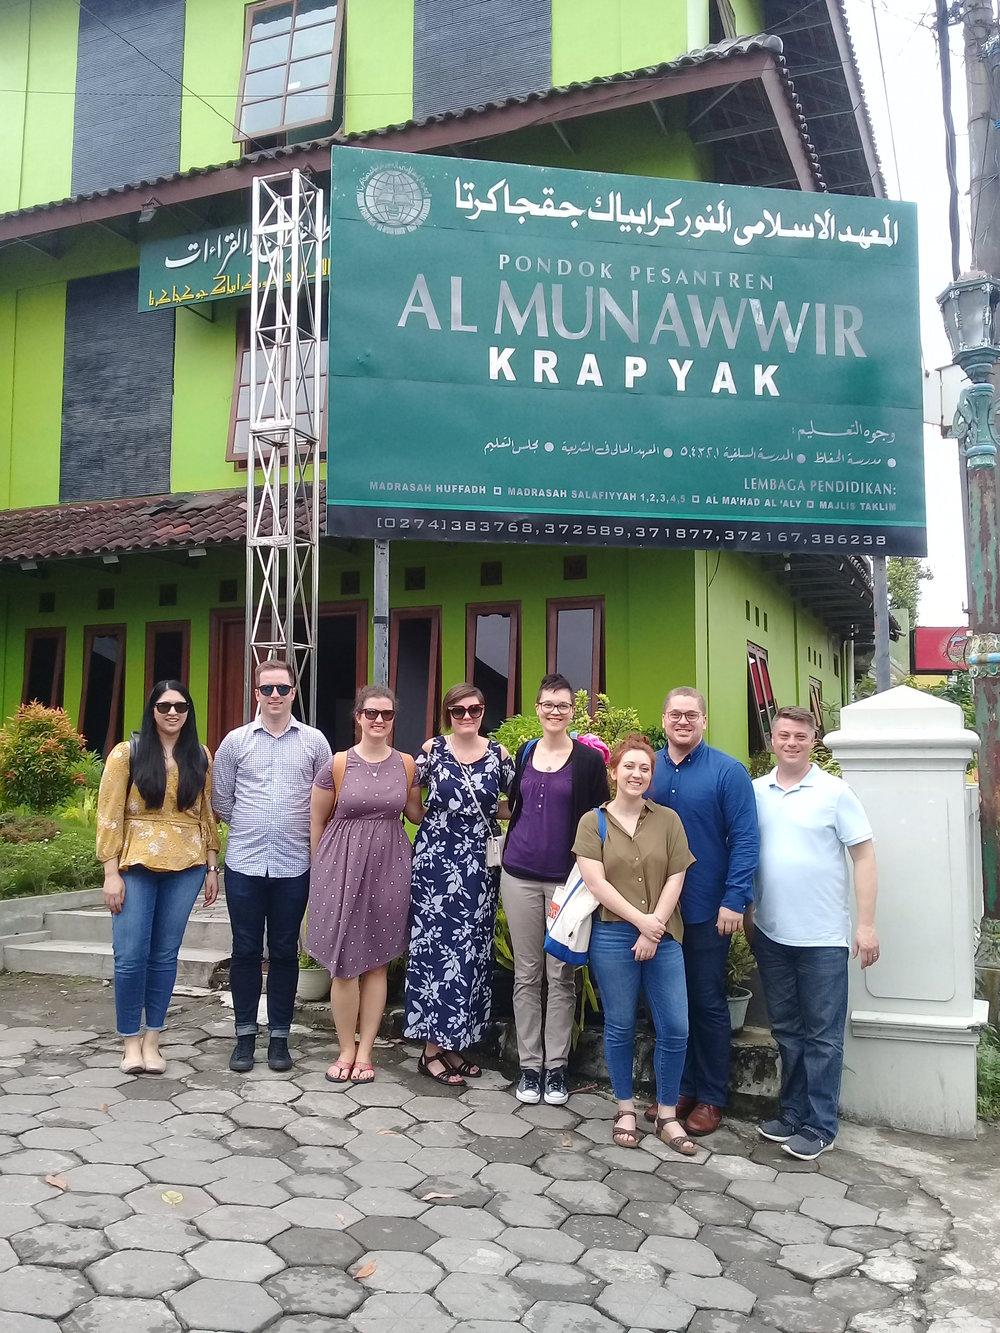 The visiting scholars at Pondok Pesantren (Islamic Boarding School) Al-Munawwir in Yogyakarta. The visitors helped lead discussions on Moderate Islam, Islam in Politics, and Islam & Gender.